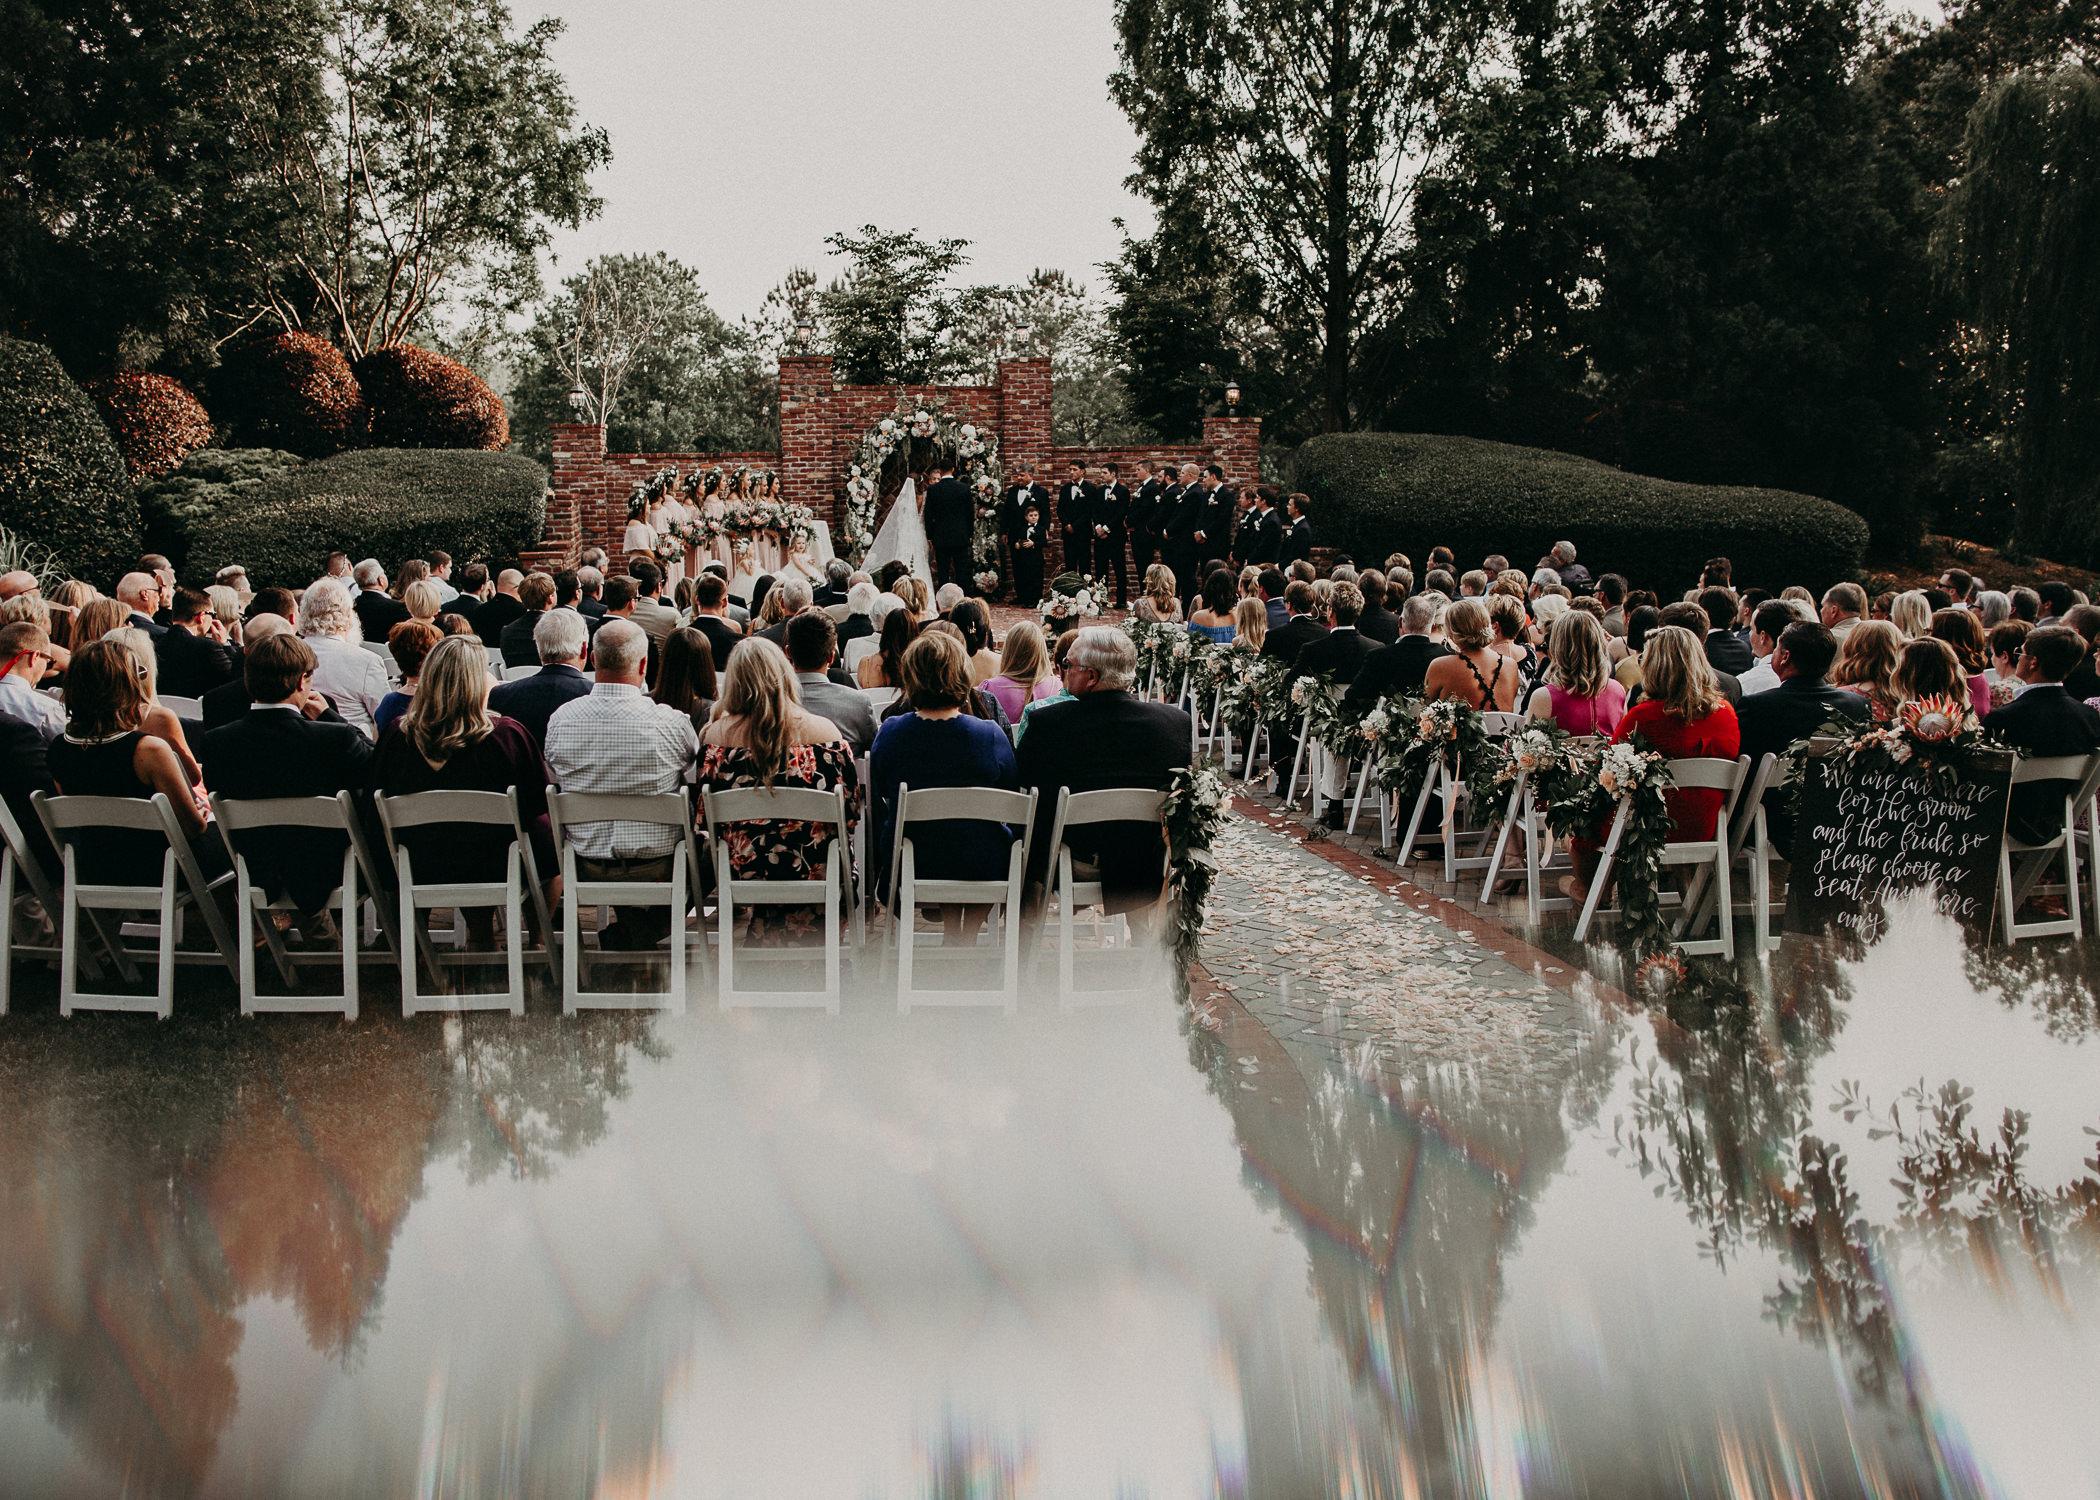 70Carl House Wedding Venue Ga, Atlanta Wedding Photographer - Boho, Bohemian, Junebug Weddings, Vintage, Retro, Trendy. Aline Marin Photography. .jpg